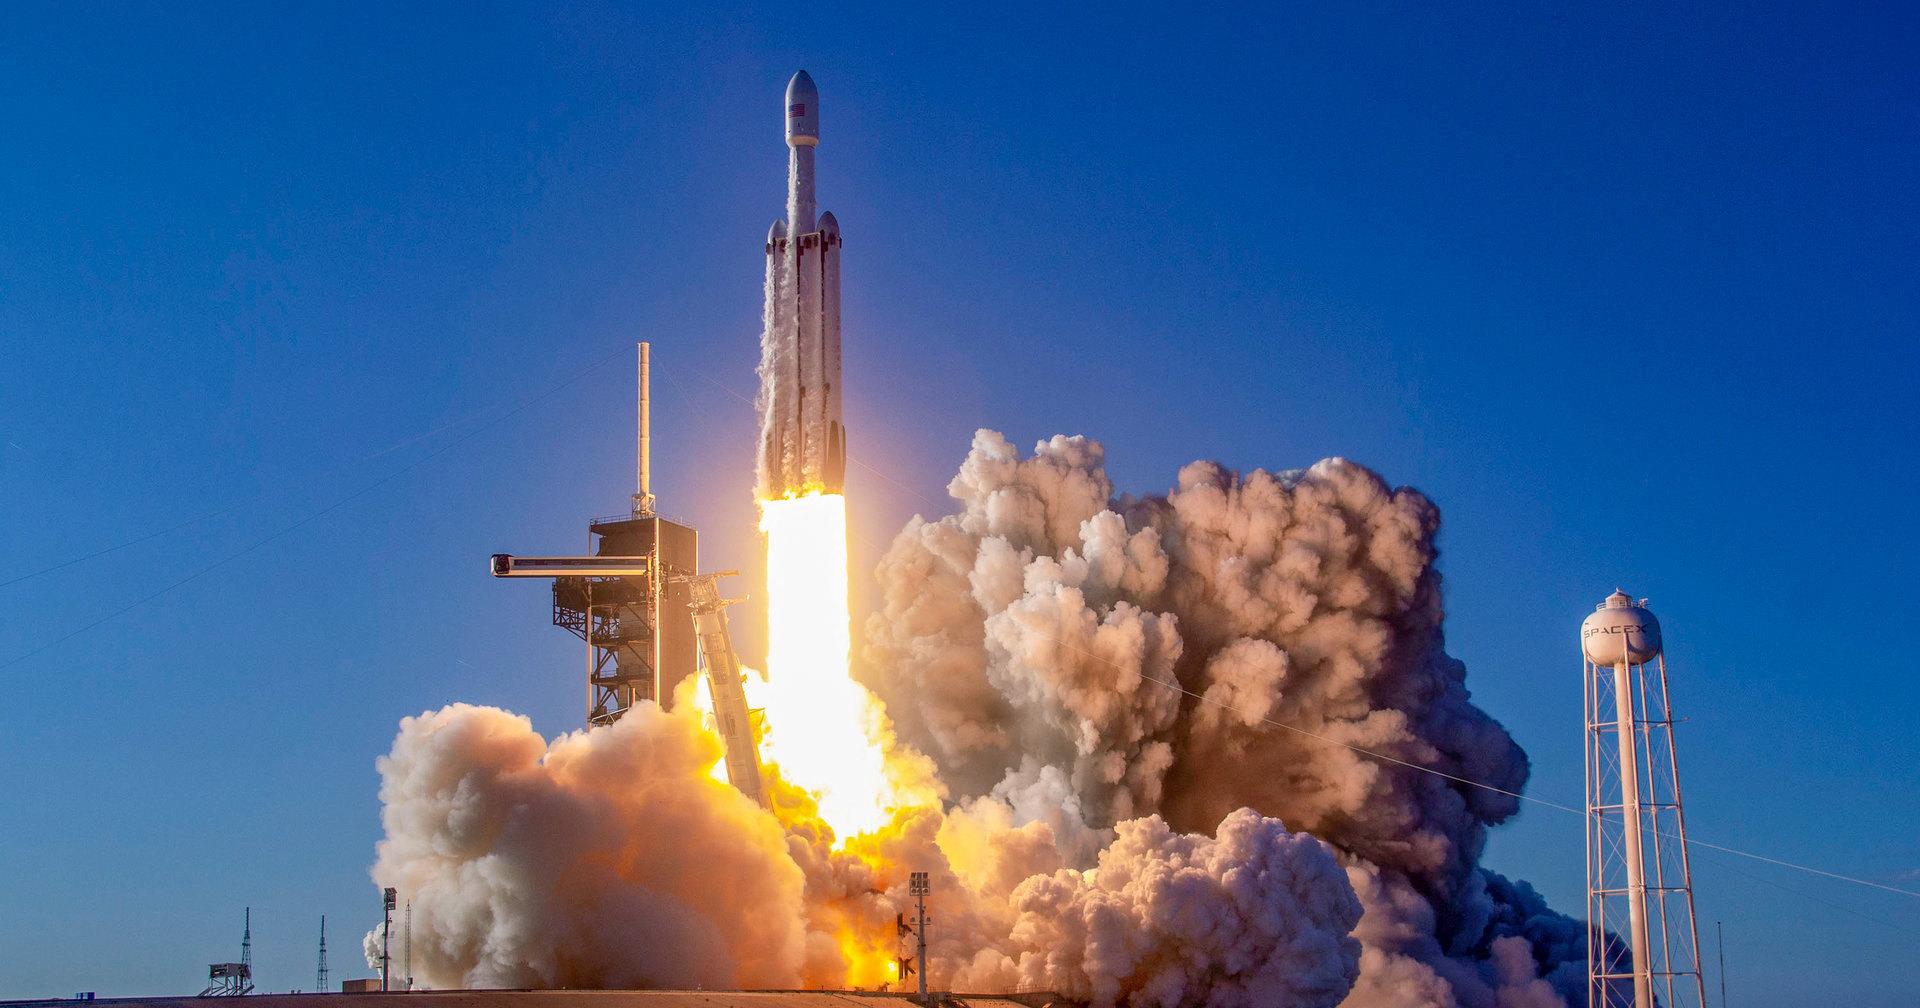 SpaceX похоронит в космосе 152 человека во время запуска Falcon Heavy